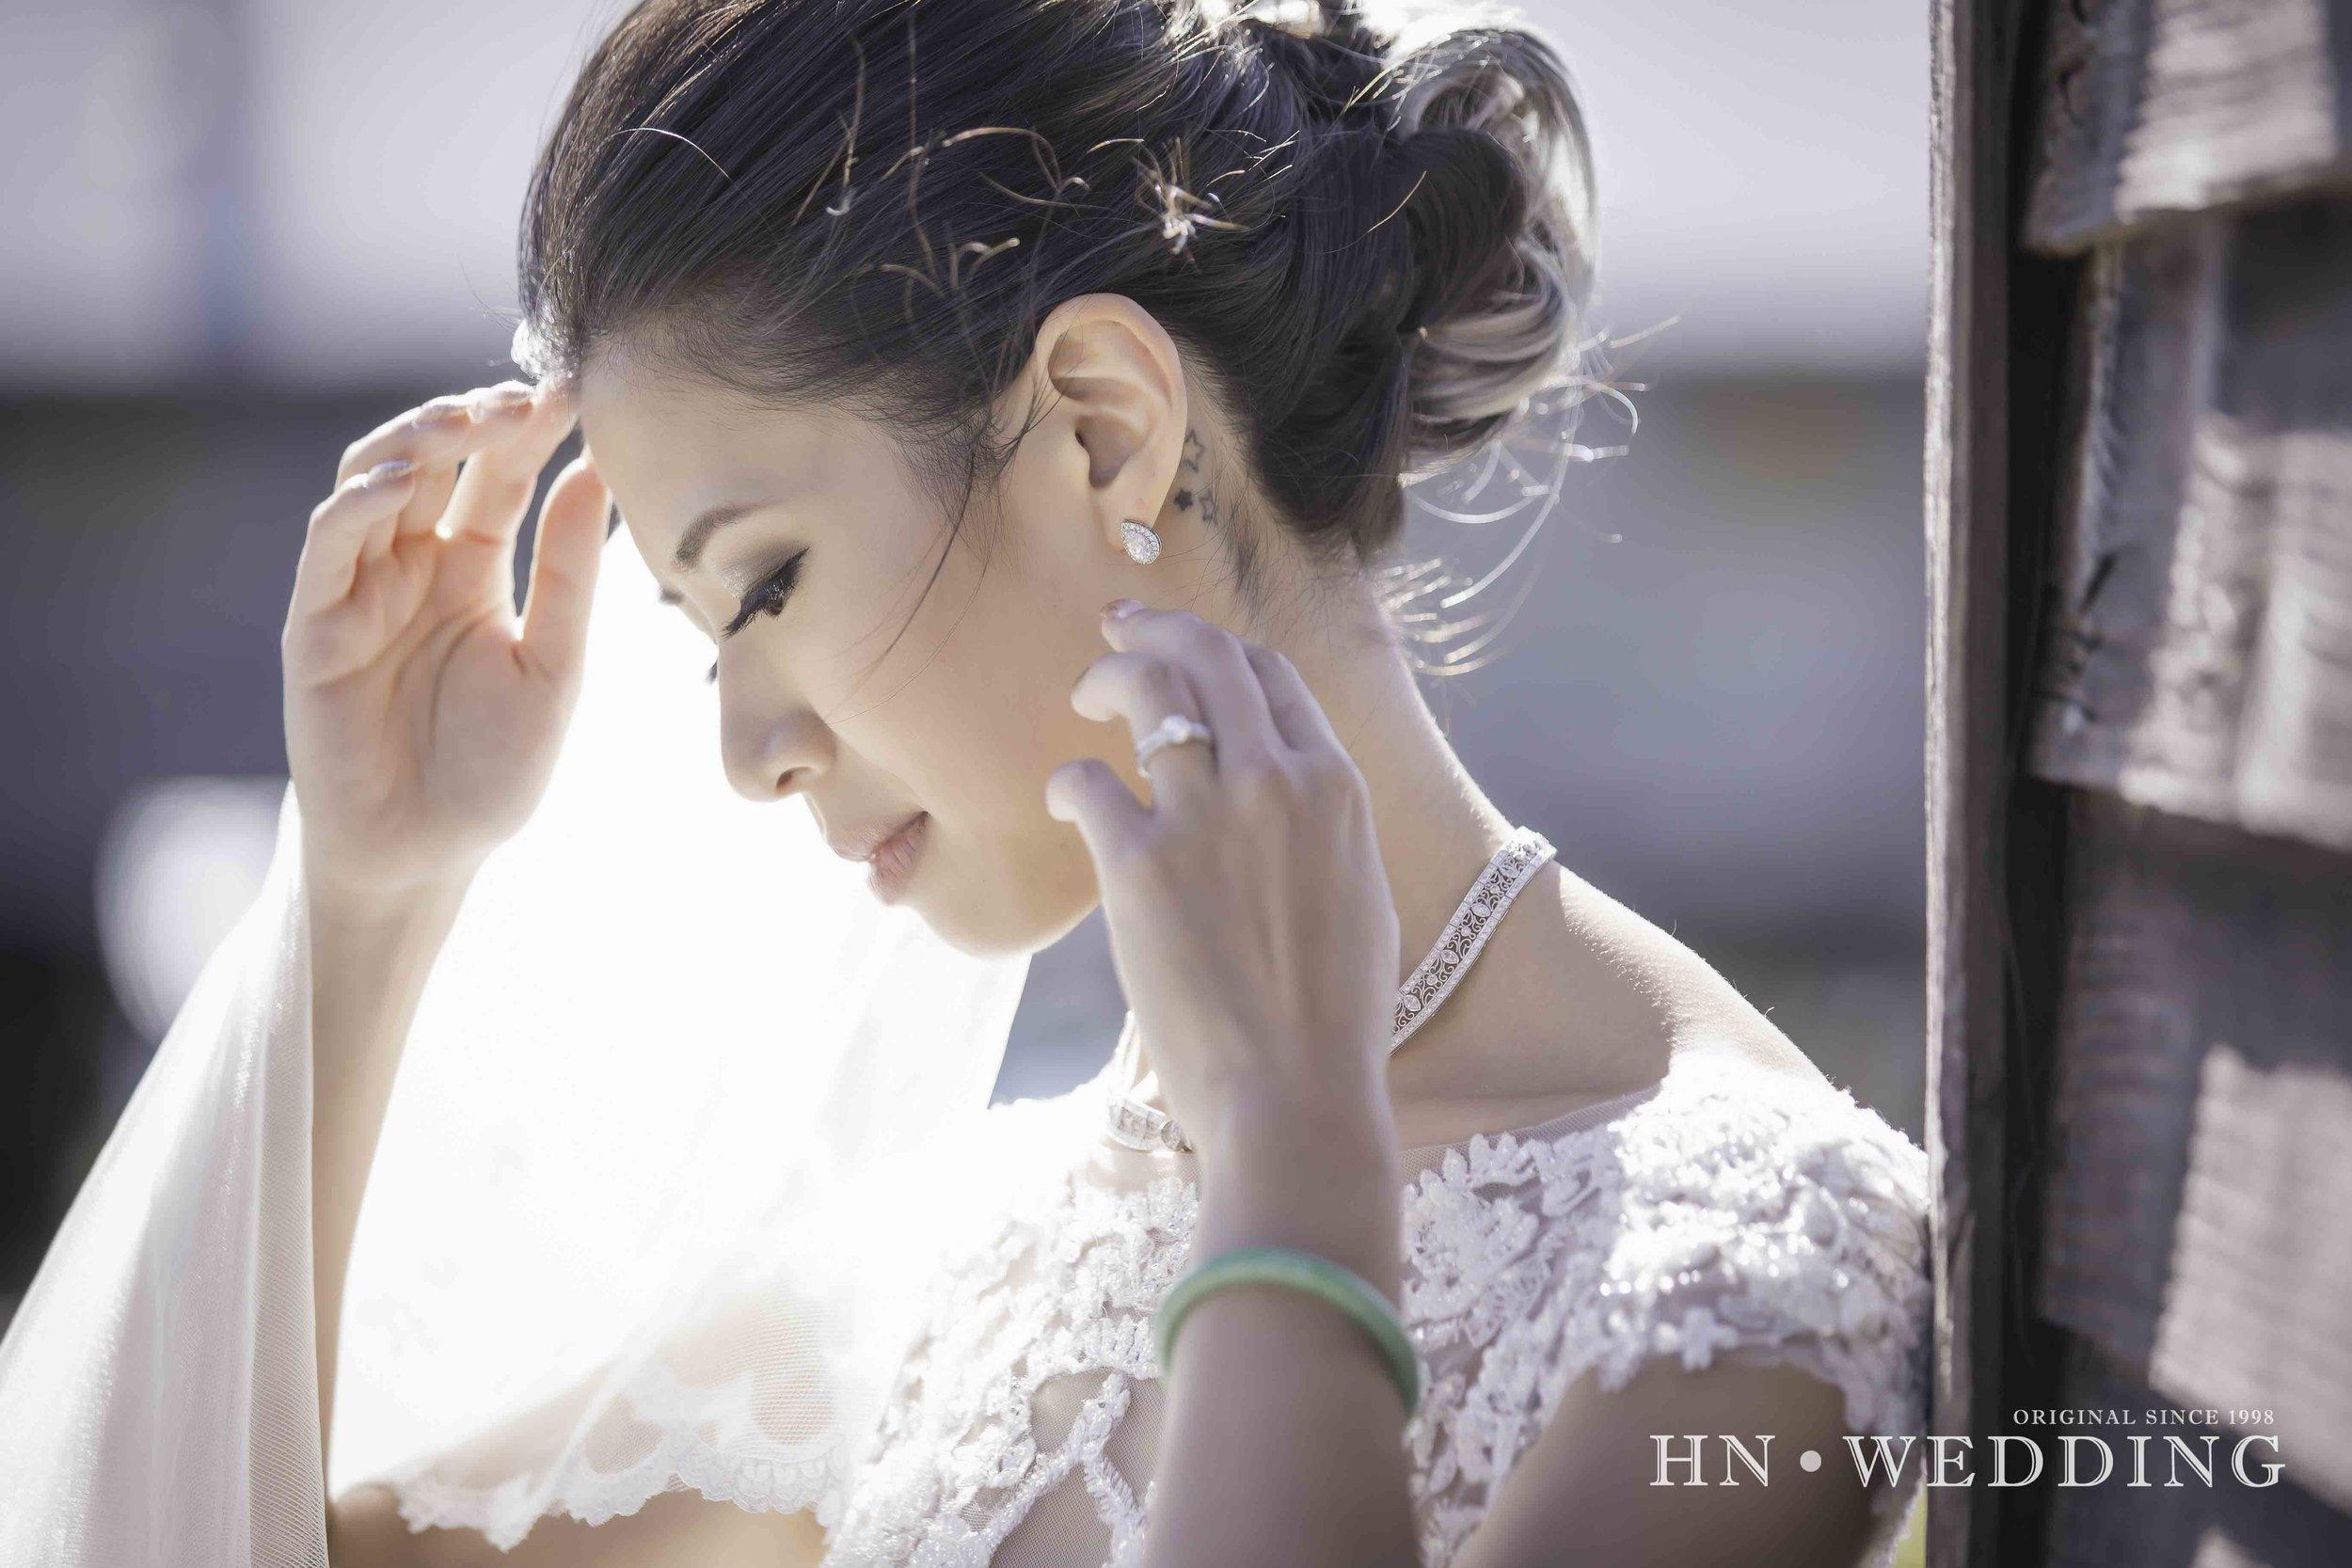 HNwedding-20160815-wedding-019.jpg